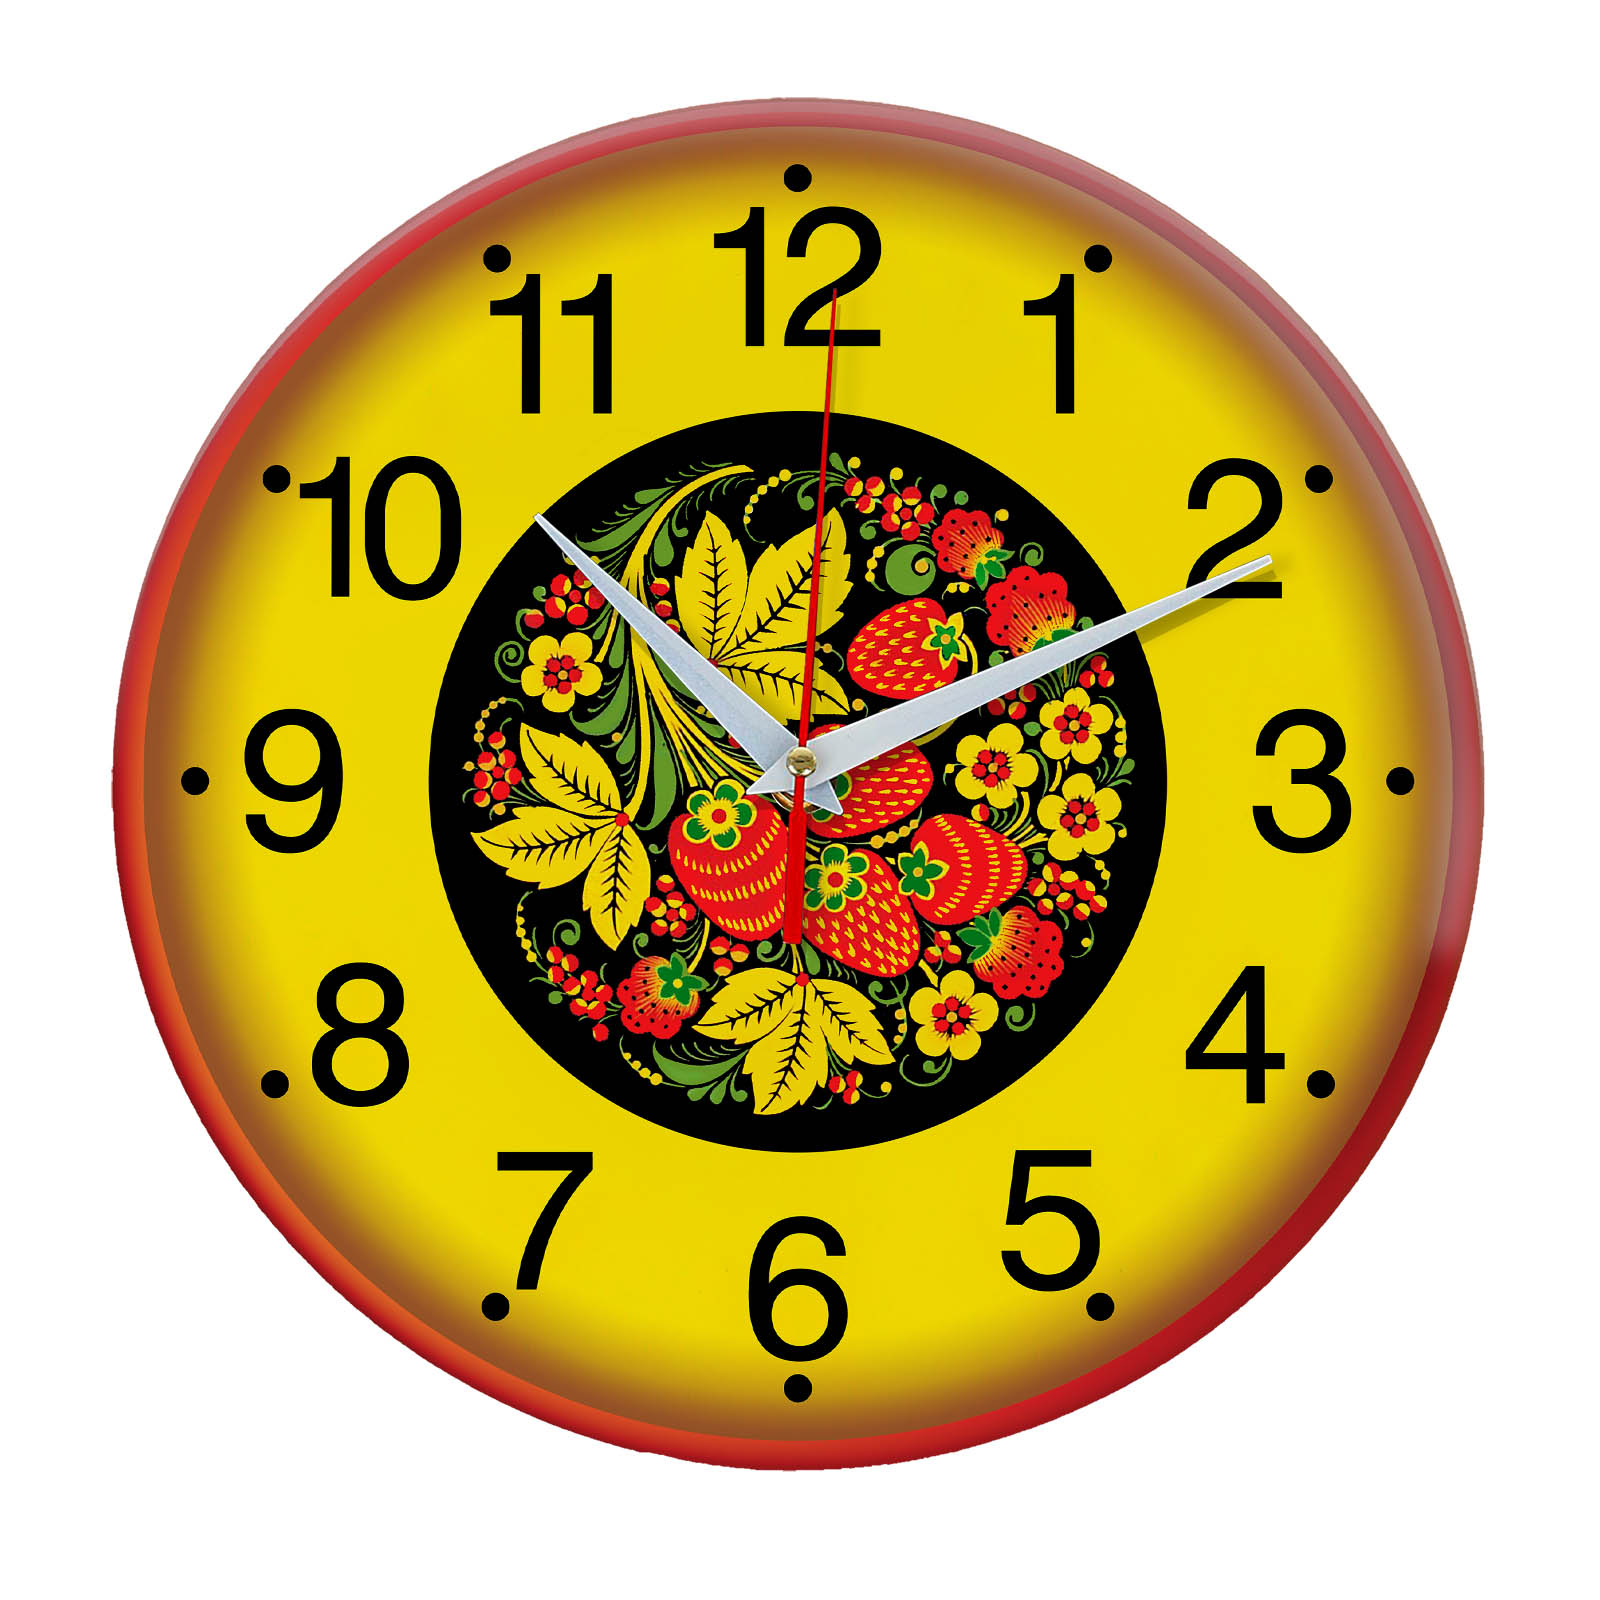 Народные промыслы часы Хохлома 2